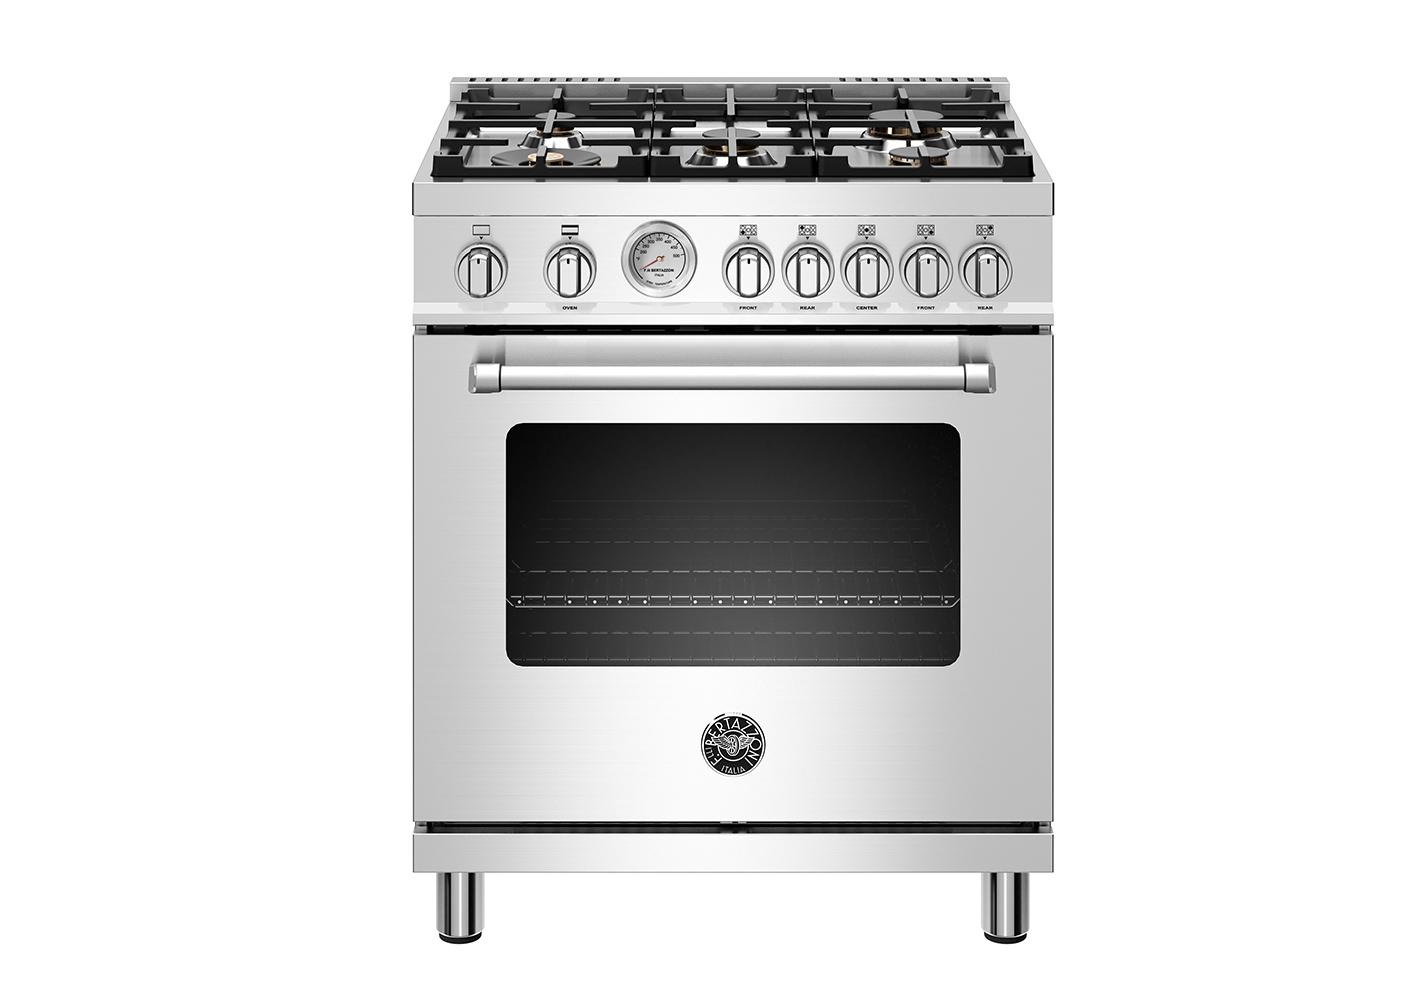 "Model: MAST305GASXELP | Bertazzoni 30"" Master Series range - Gas oven - 5 aluminum burners - LP version"